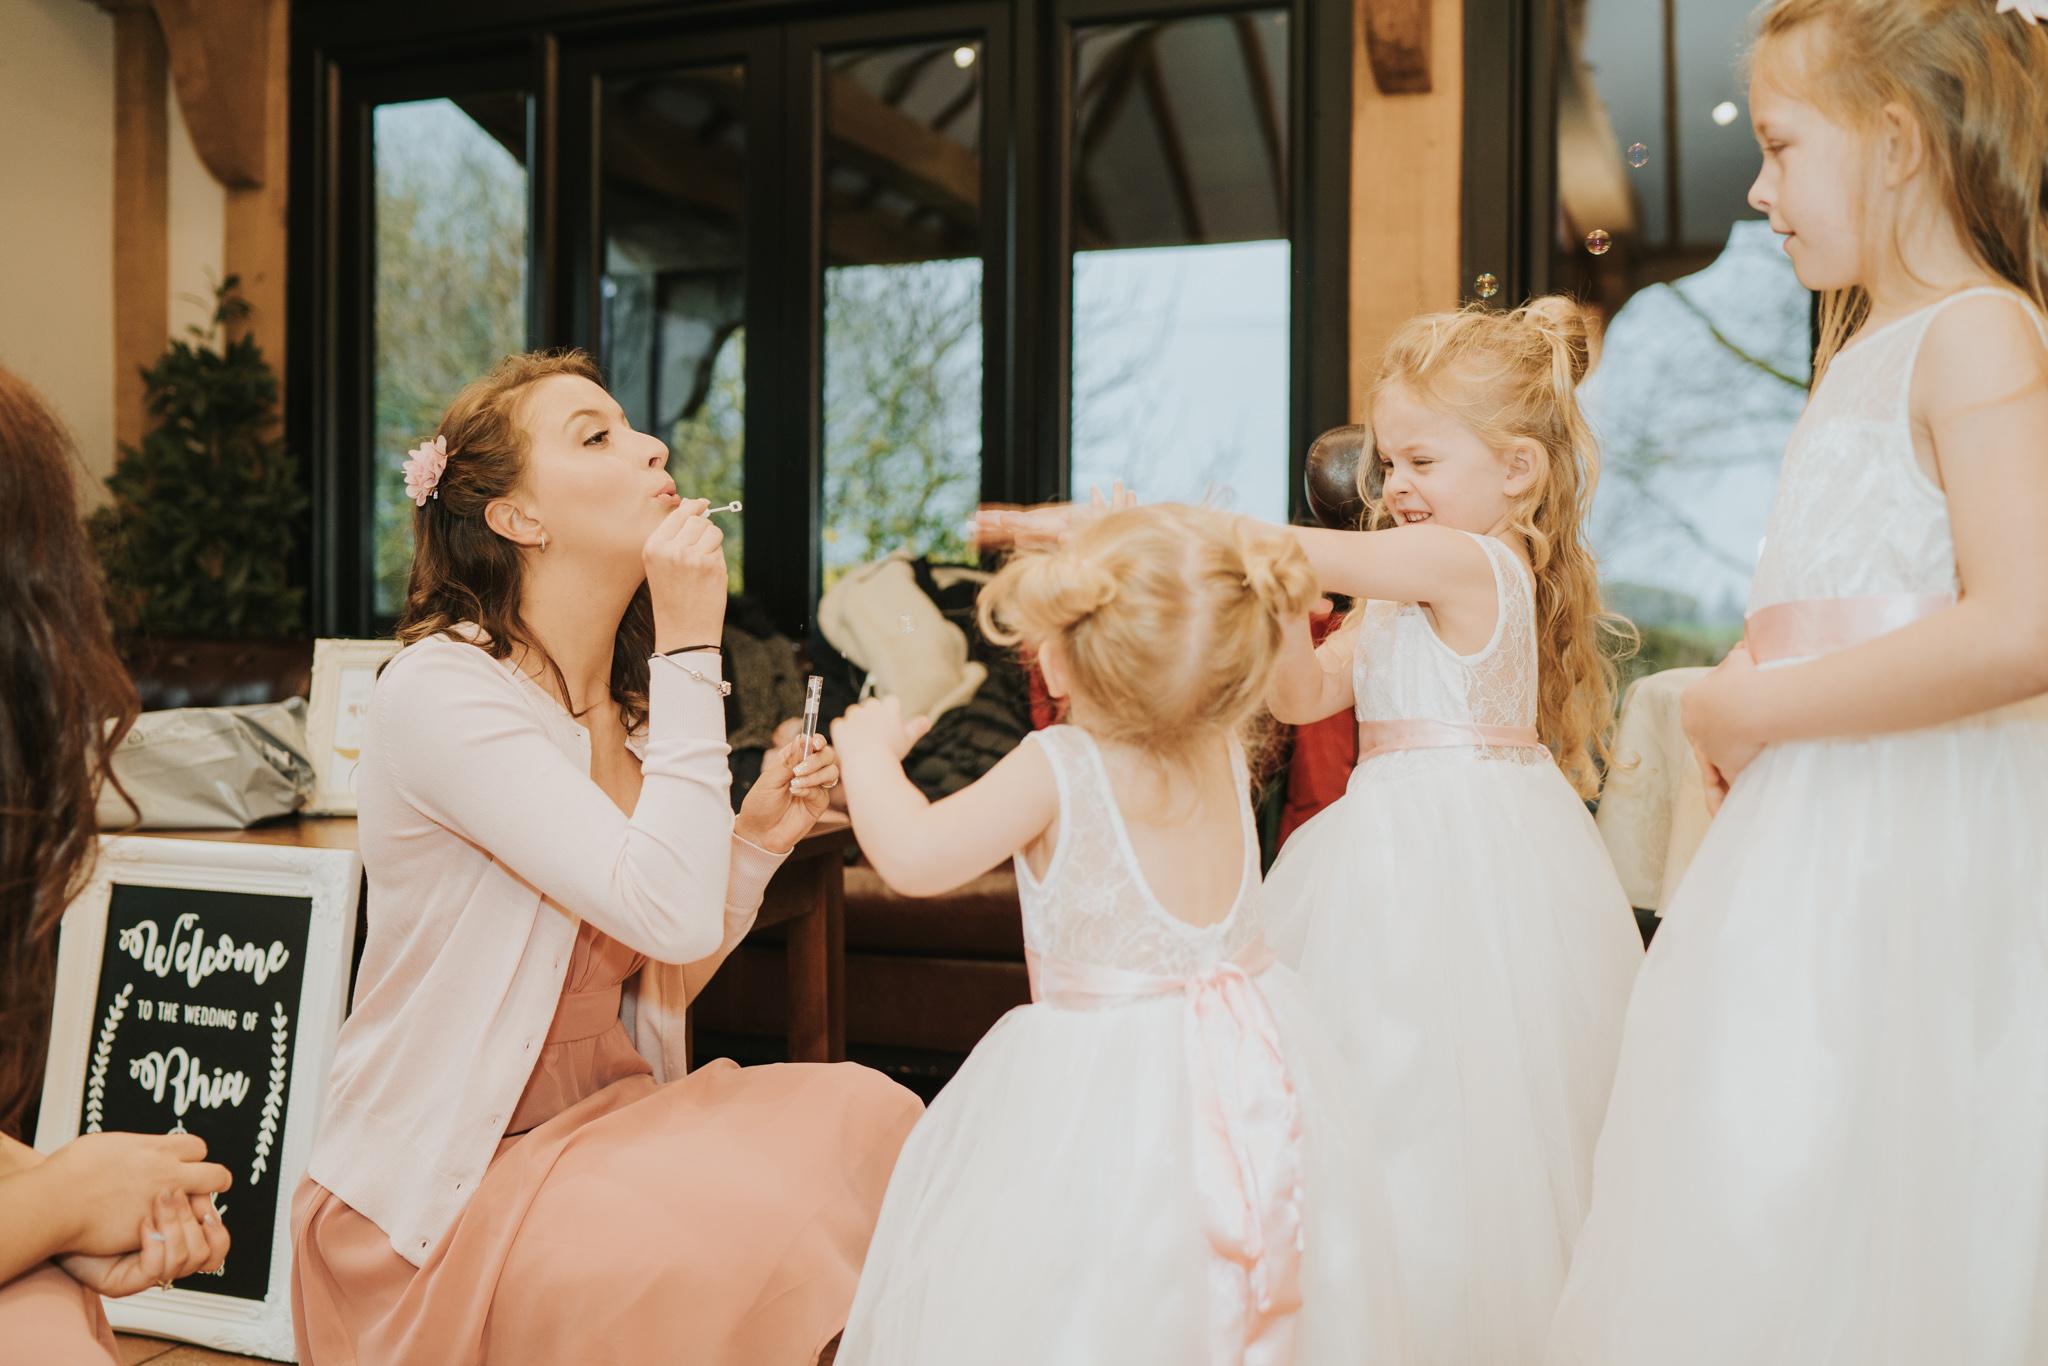 rhia-james-rustic-crabbs-barn-vintage-50s-retro-wedding-grace-elizabeth-colchester-essex-alternative-relaxed-wedding-family-photography-devon-suffolk-norfolk-essex (58 of 138).jpg